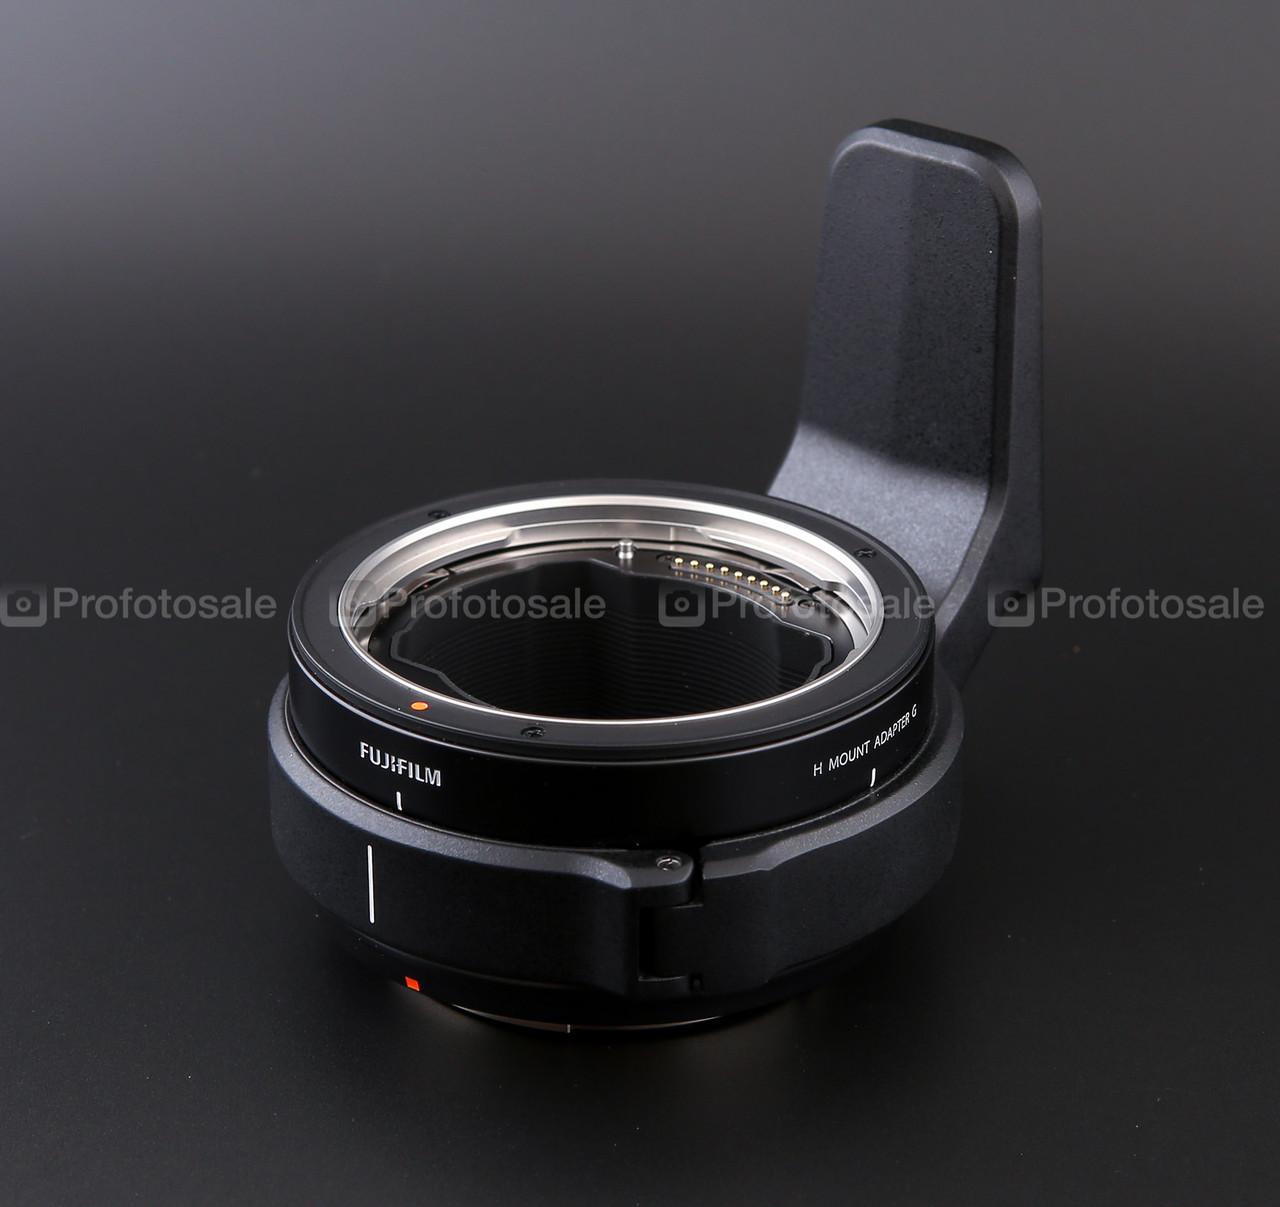 Переходник для установки оптики Hasselblad H на Fujifilm GFX5 (H mount adapter G)